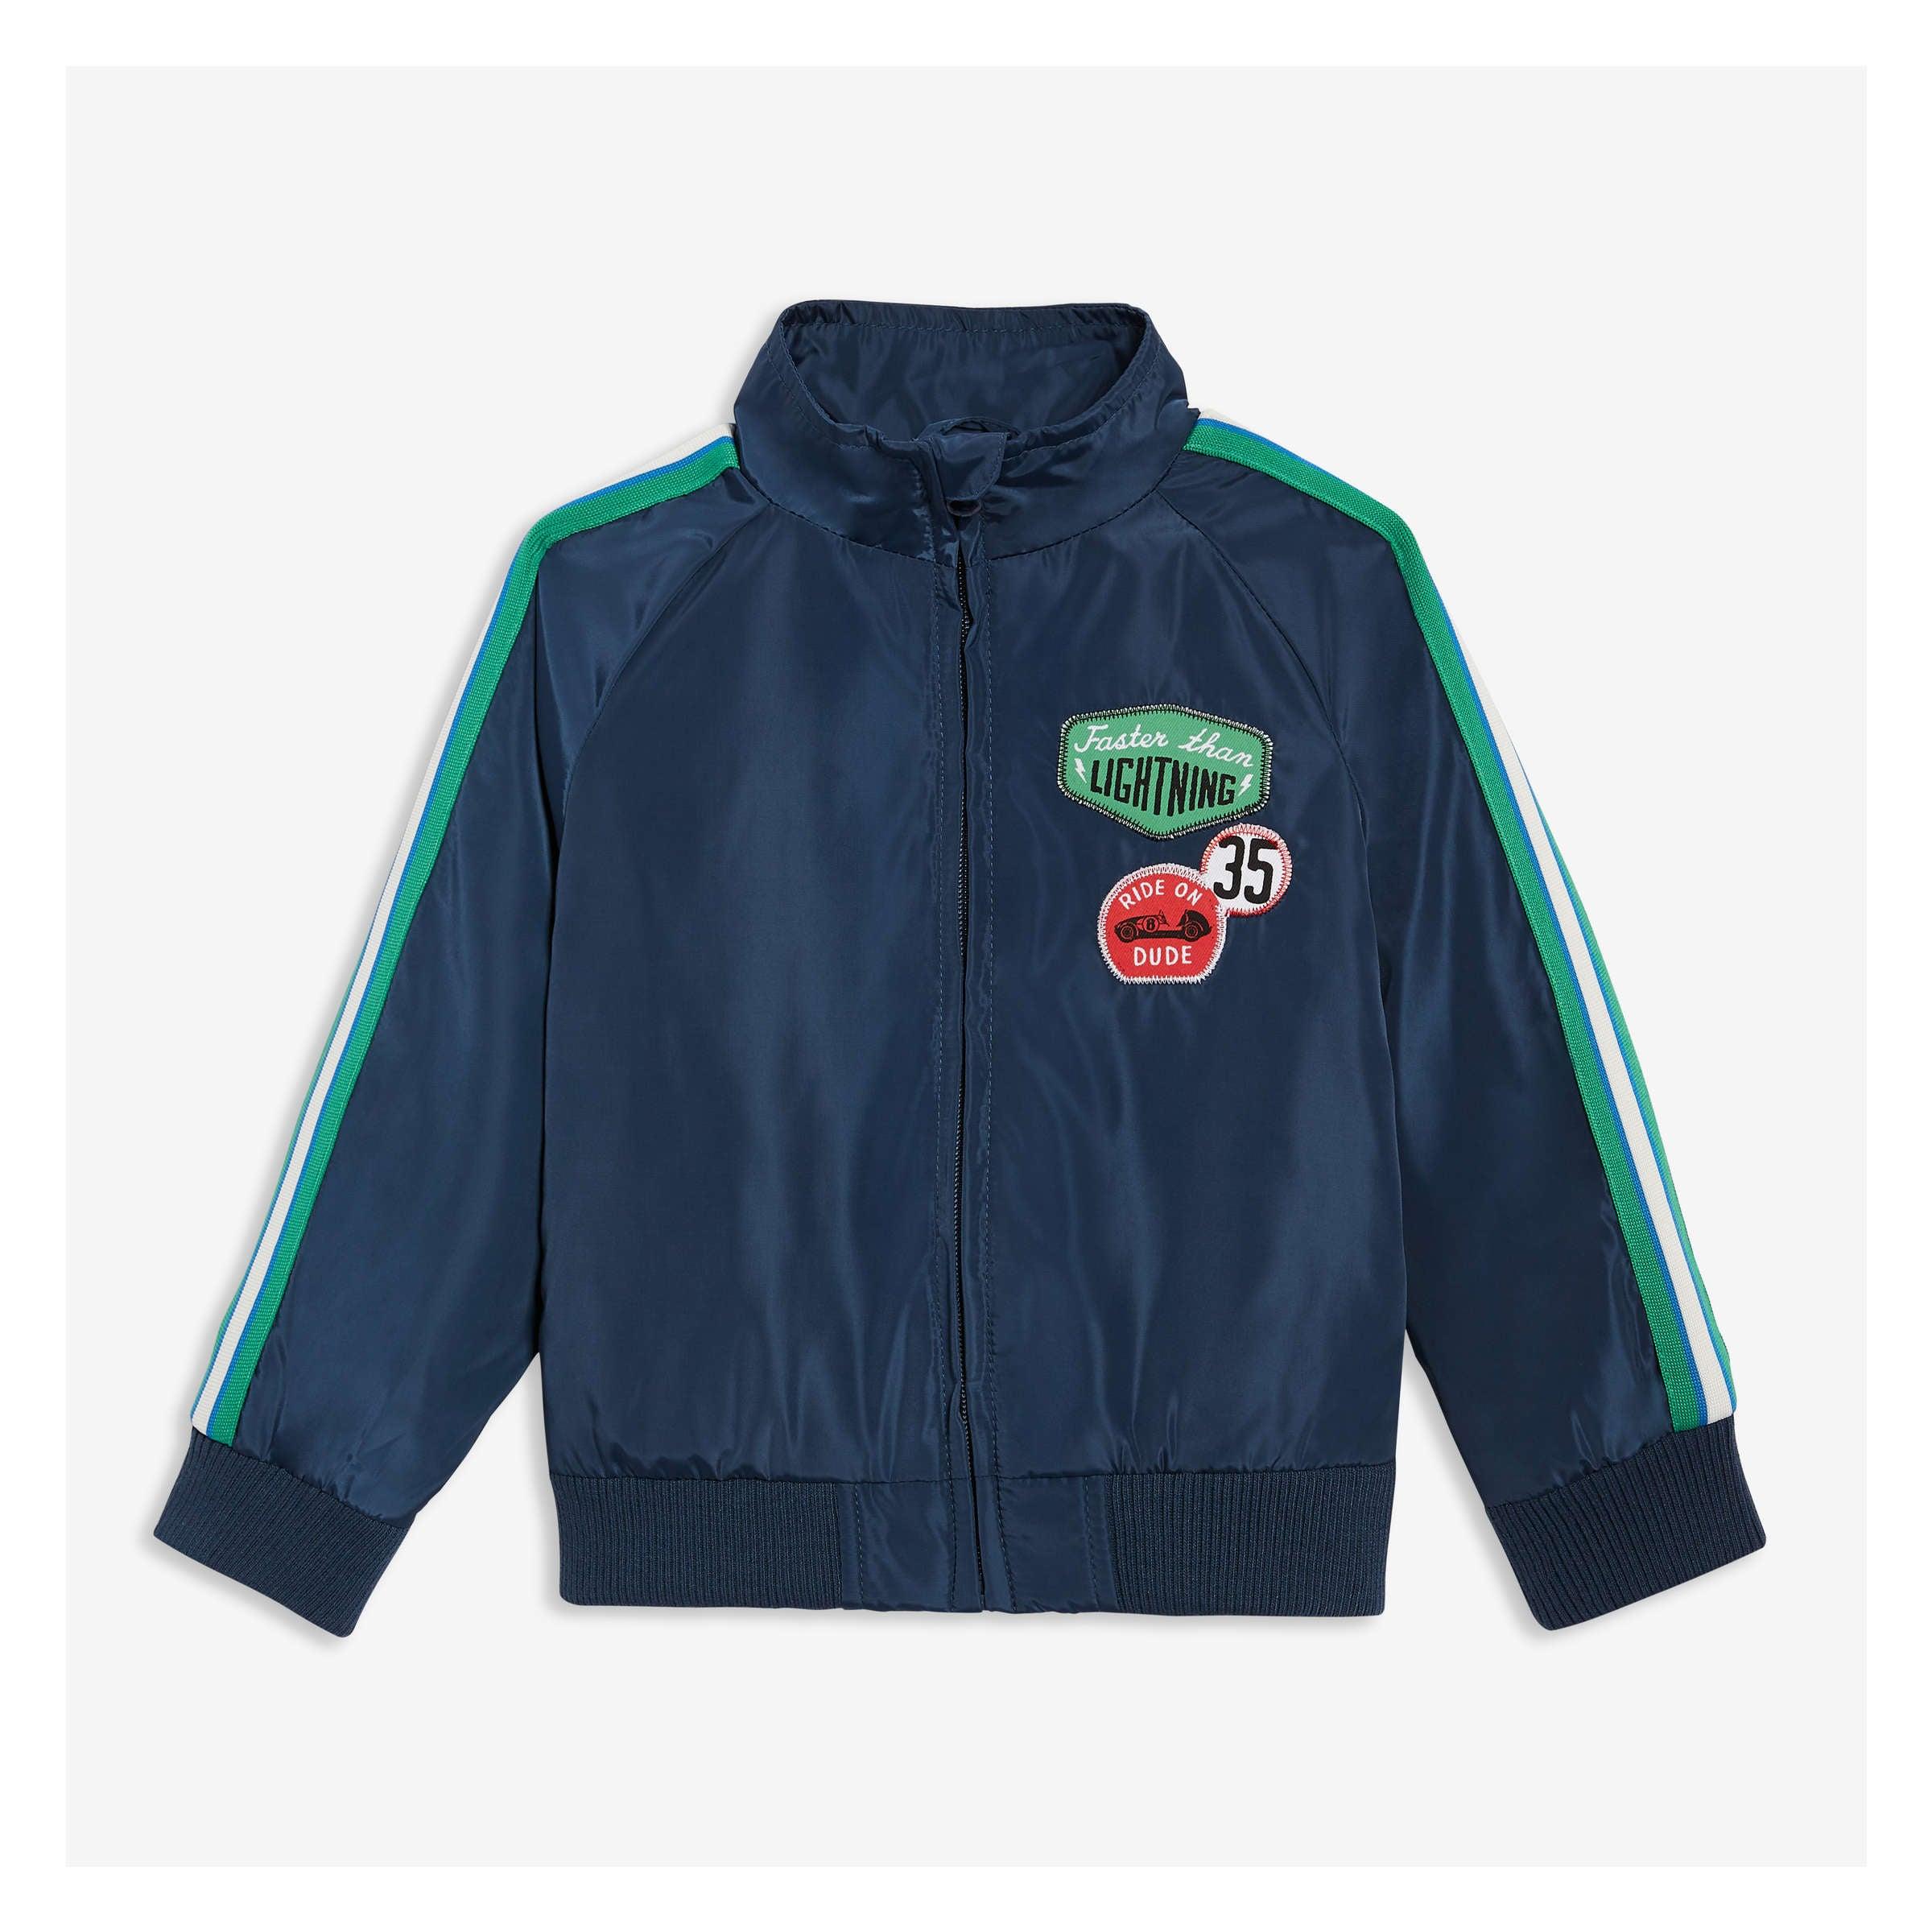 5f31a27cf18 Joe Fresh Toddler Boys' Race Car Patch Track Jacket